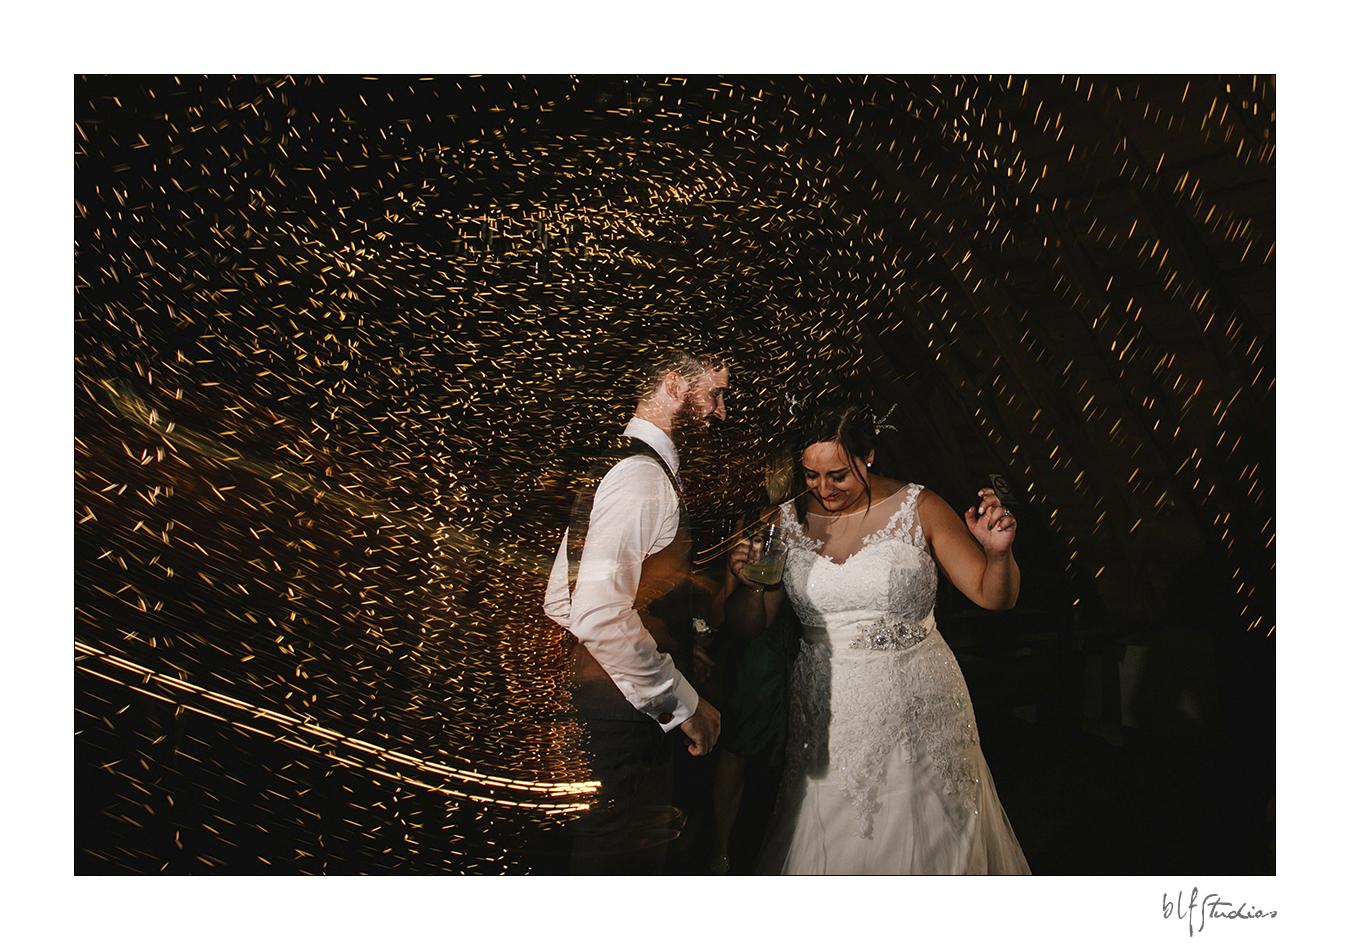 036-manitoba-rustic-barn-wedding-photos.jpg